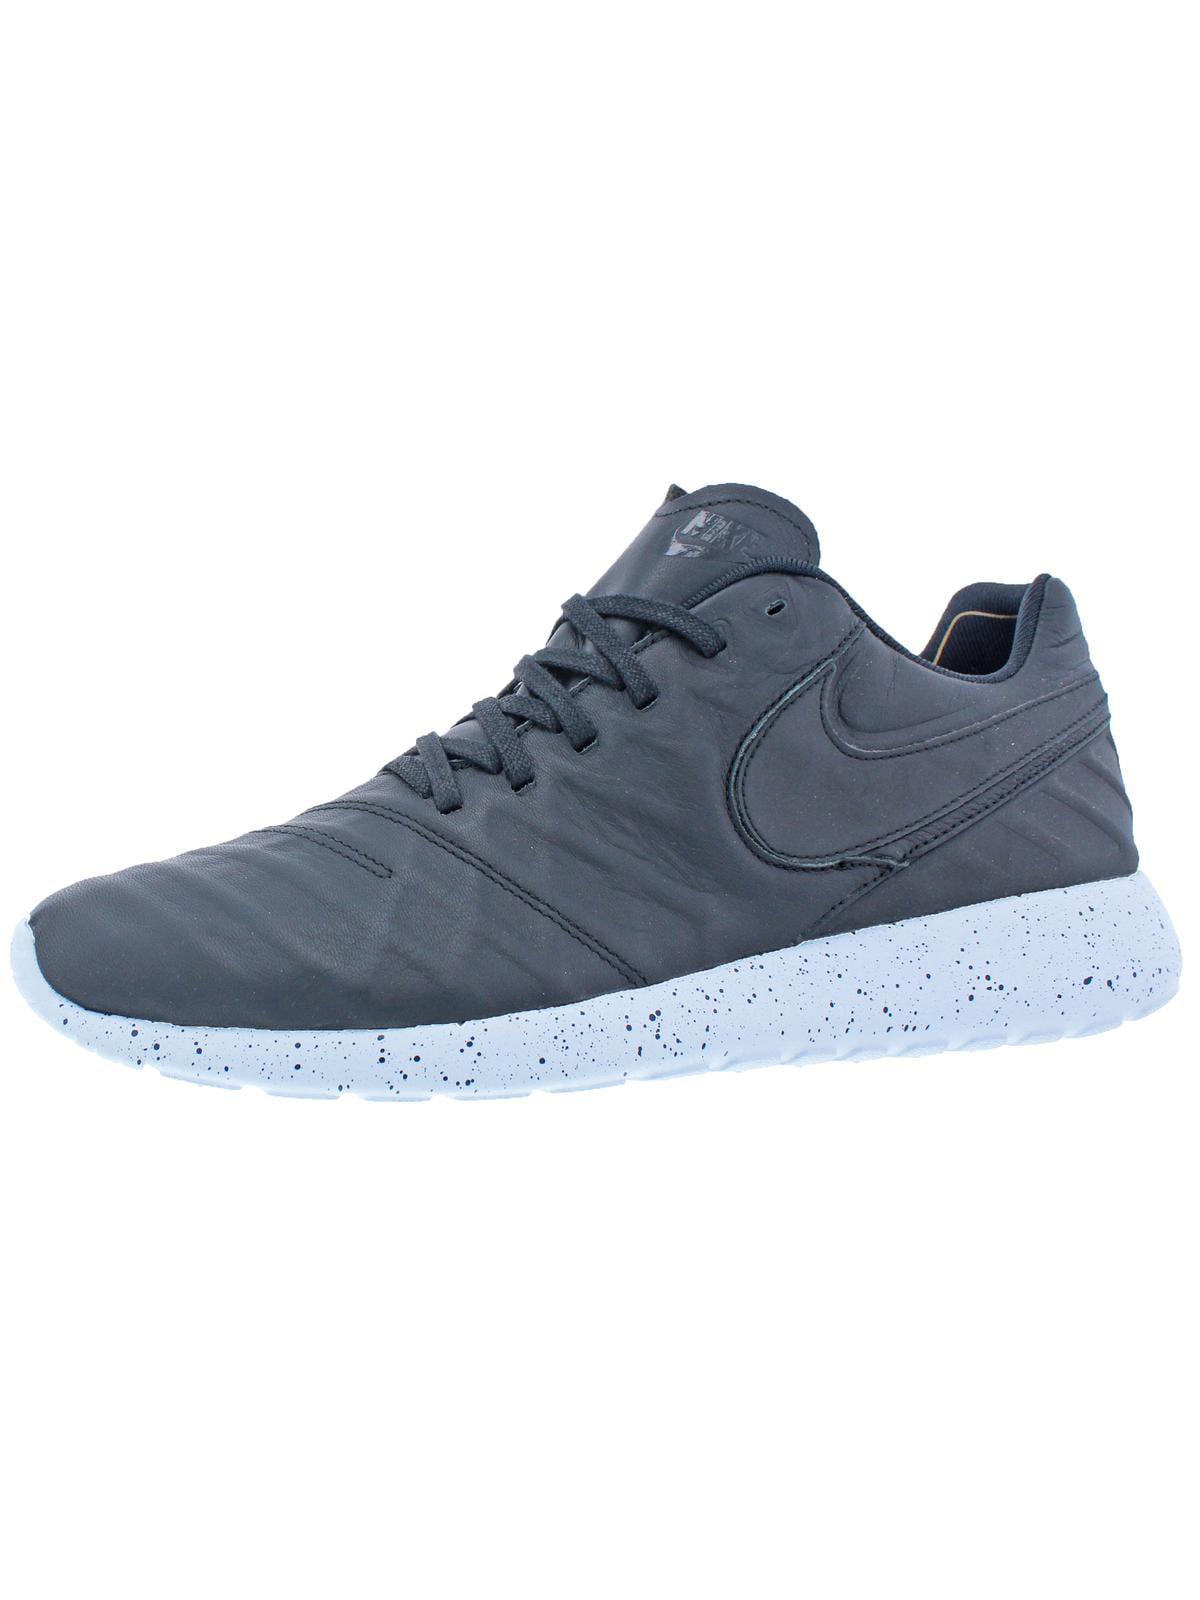 Nike Mens Roshe Tiemo VI Casual Low-Top Fashion Sneakers Black 11.5 Medium (D)